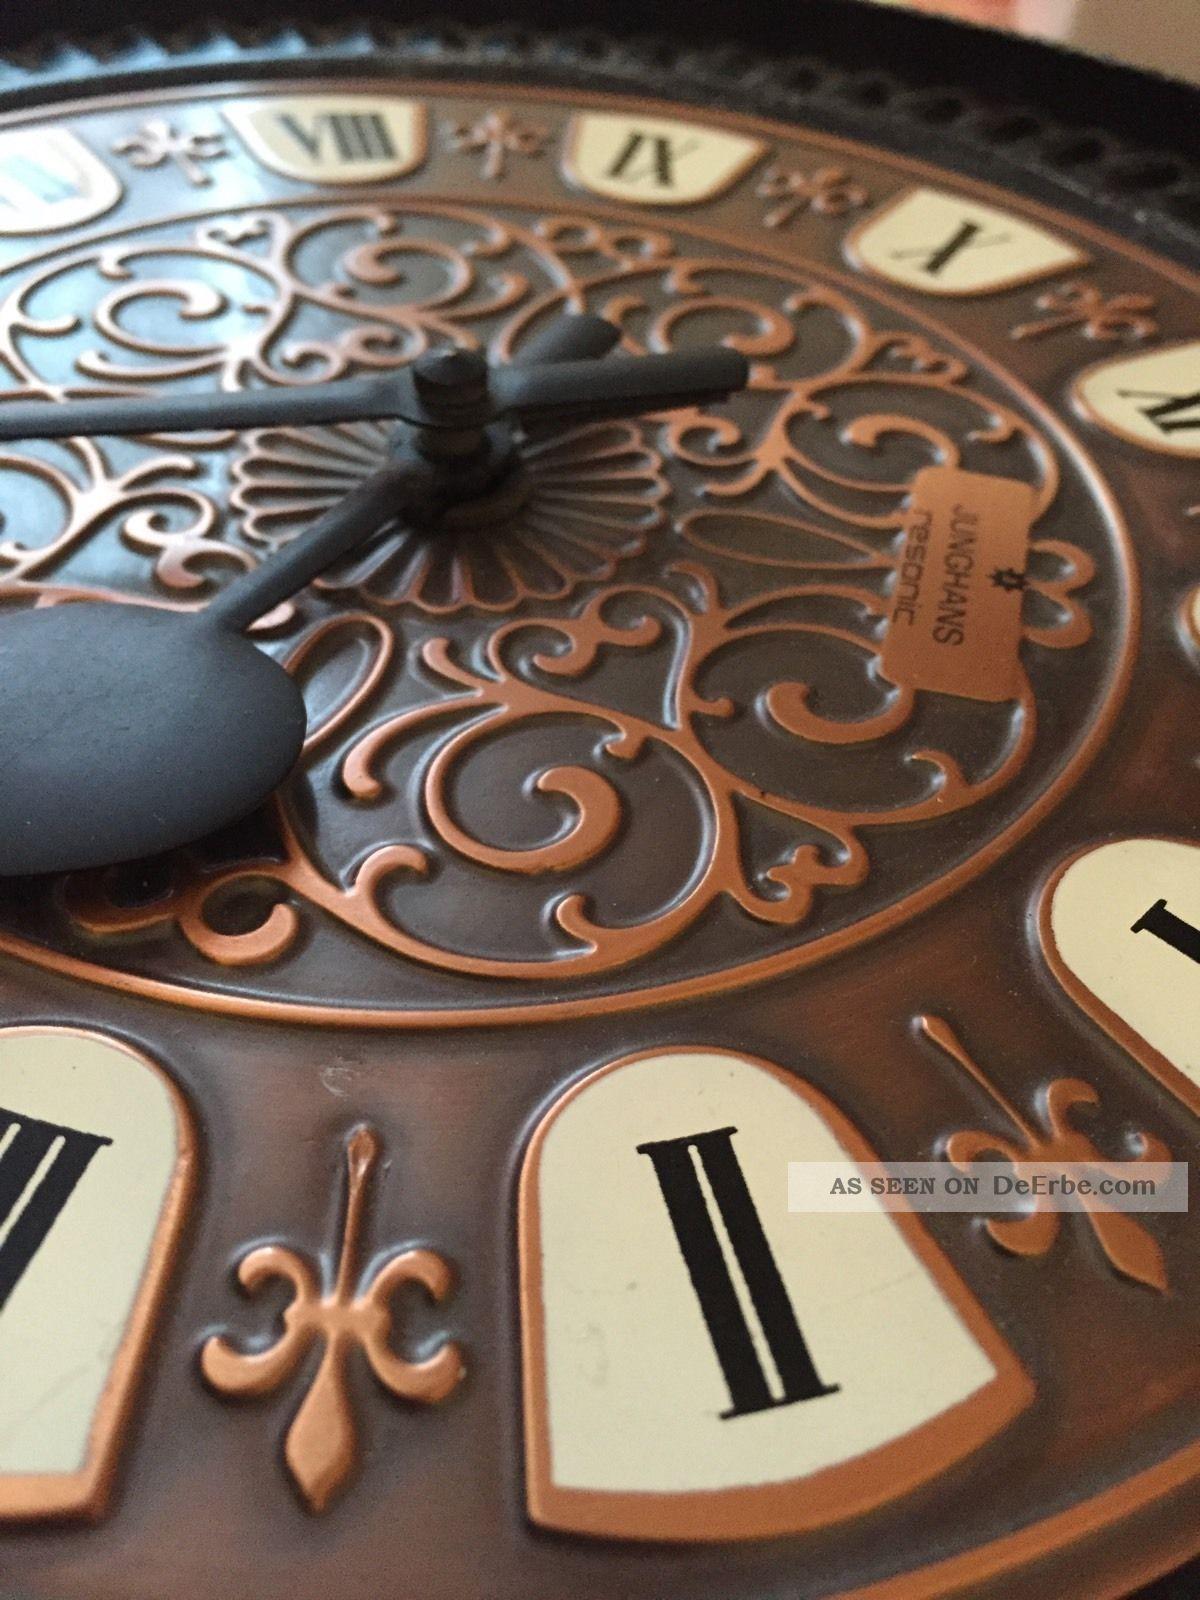 junghans resonic wanduhr rar ornamente gusseisen metall. Black Bedroom Furniture Sets. Home Design Ideas